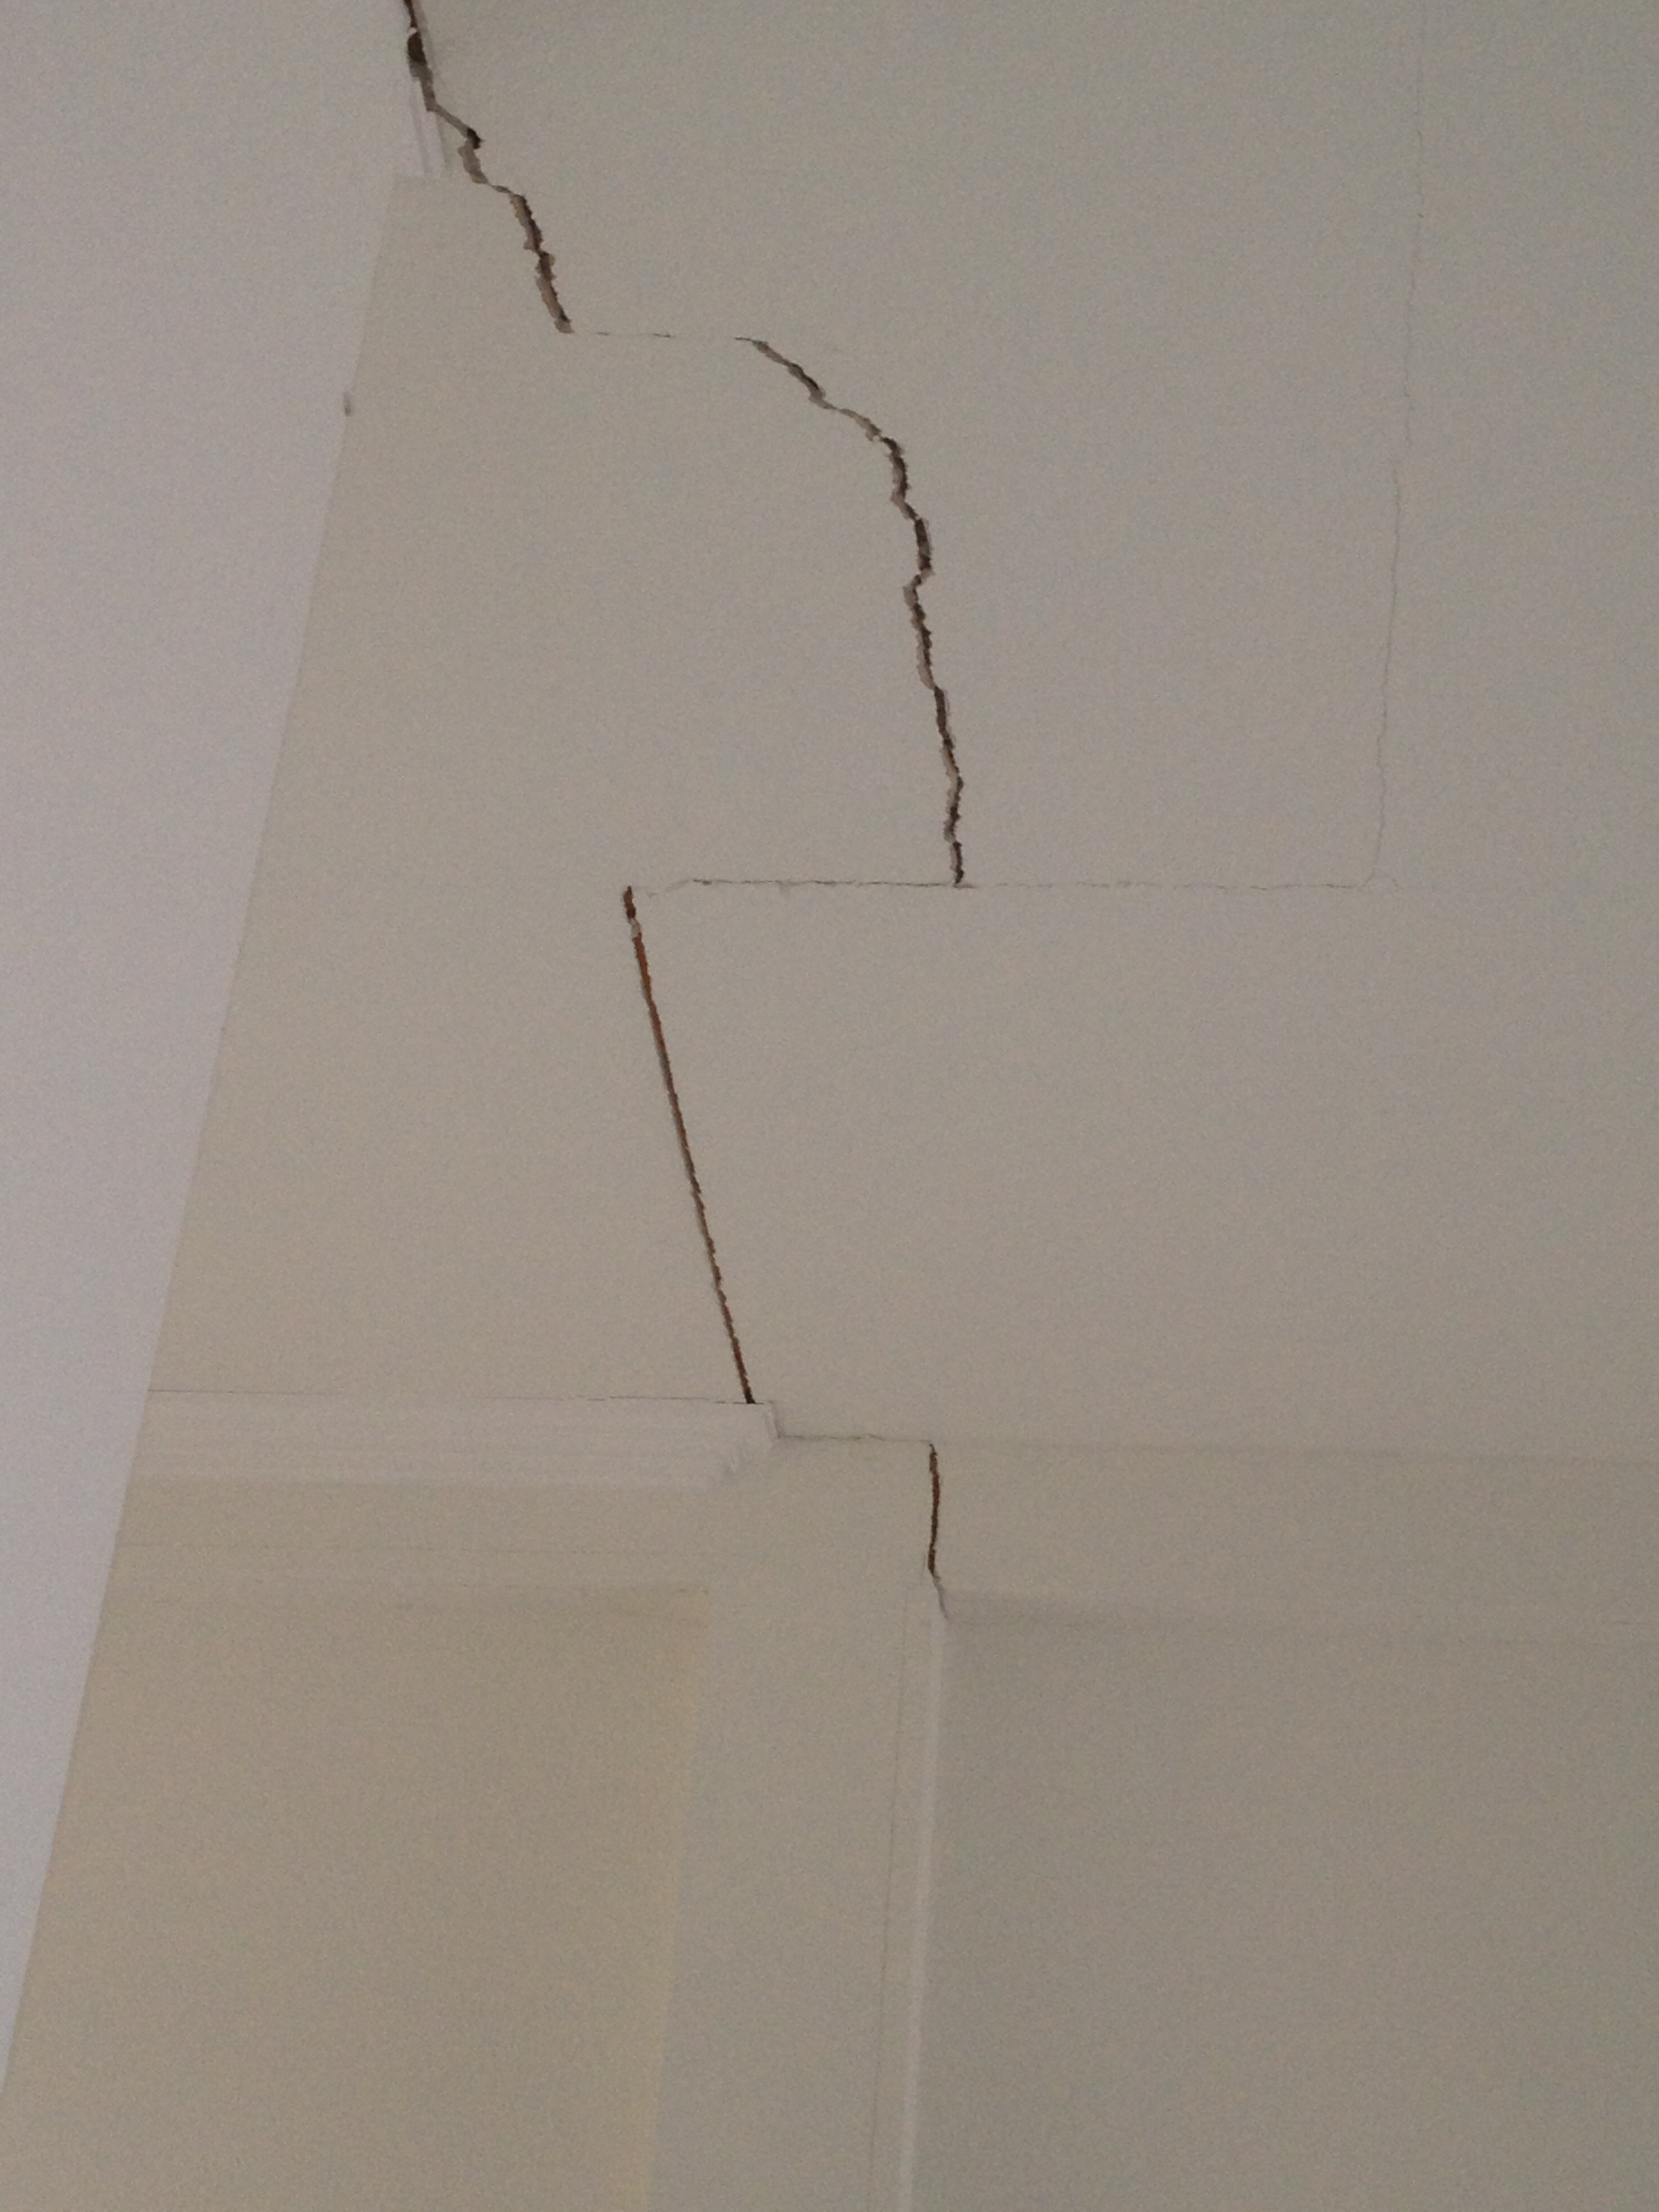 Concrete Repair Systems Foundation Repair image 4